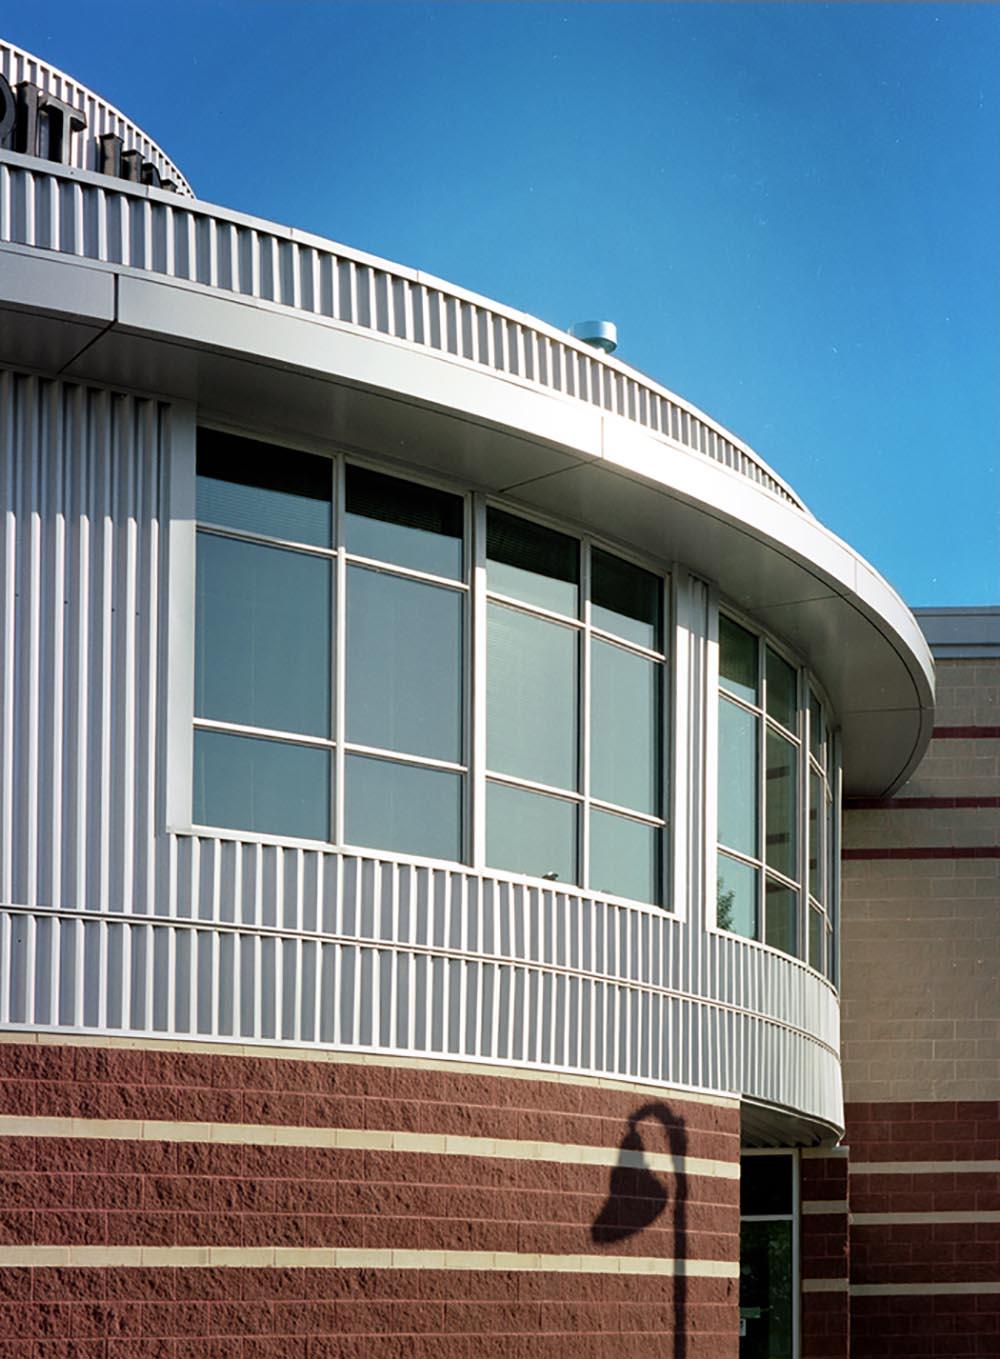 Holy Spirit (Entegra) Credit Union, exterior detail photo of building